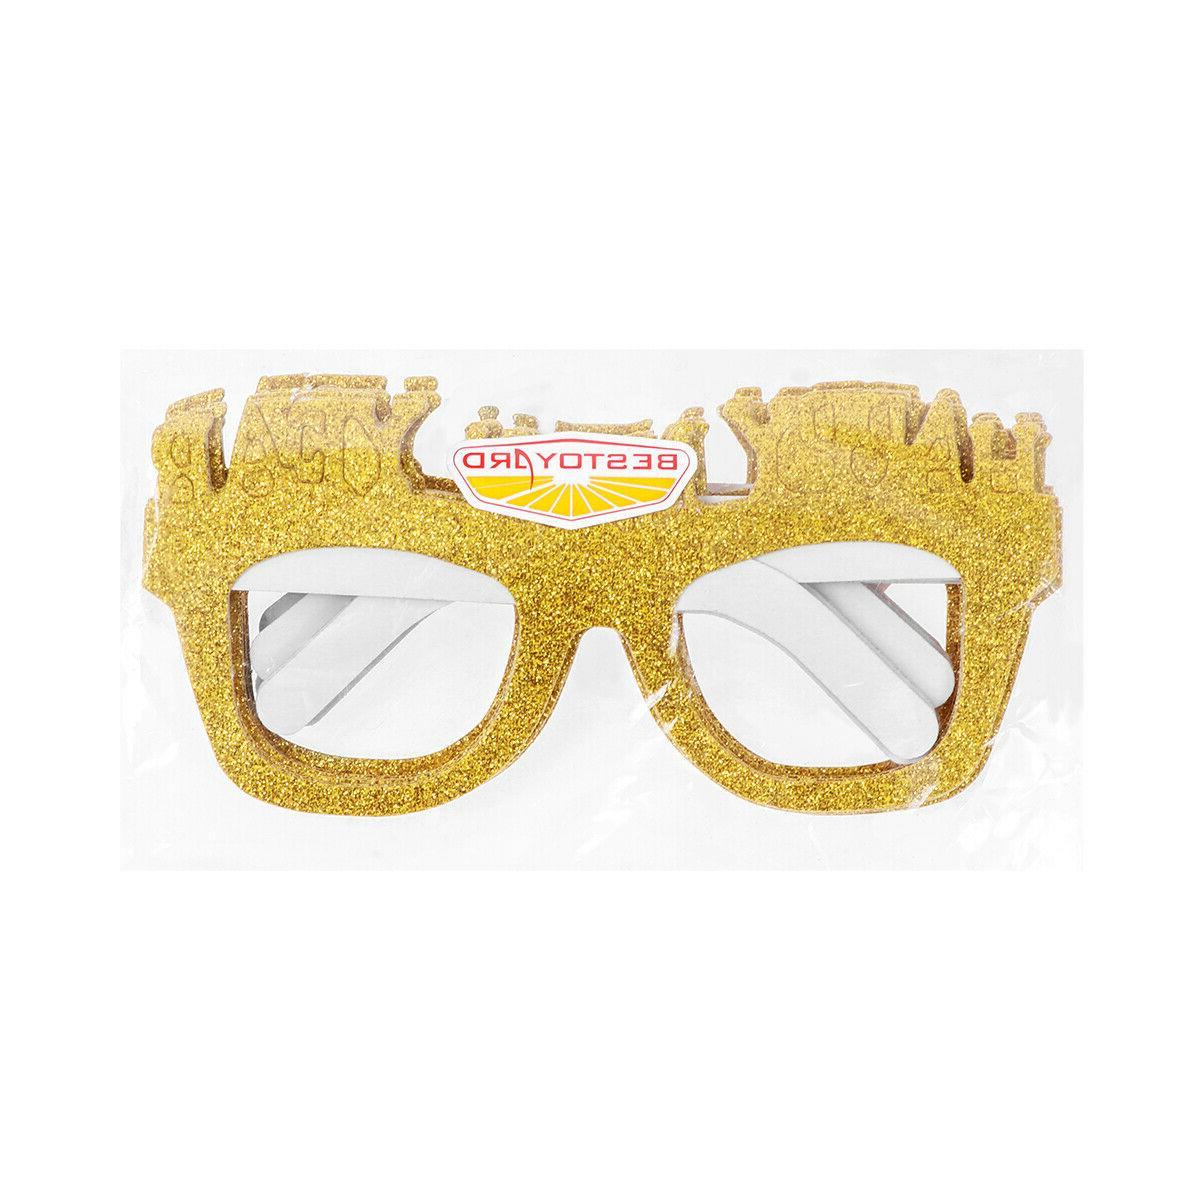 BESTOYARD 10pcs Greative Glitter Eyeglasses Glasses Frame fo